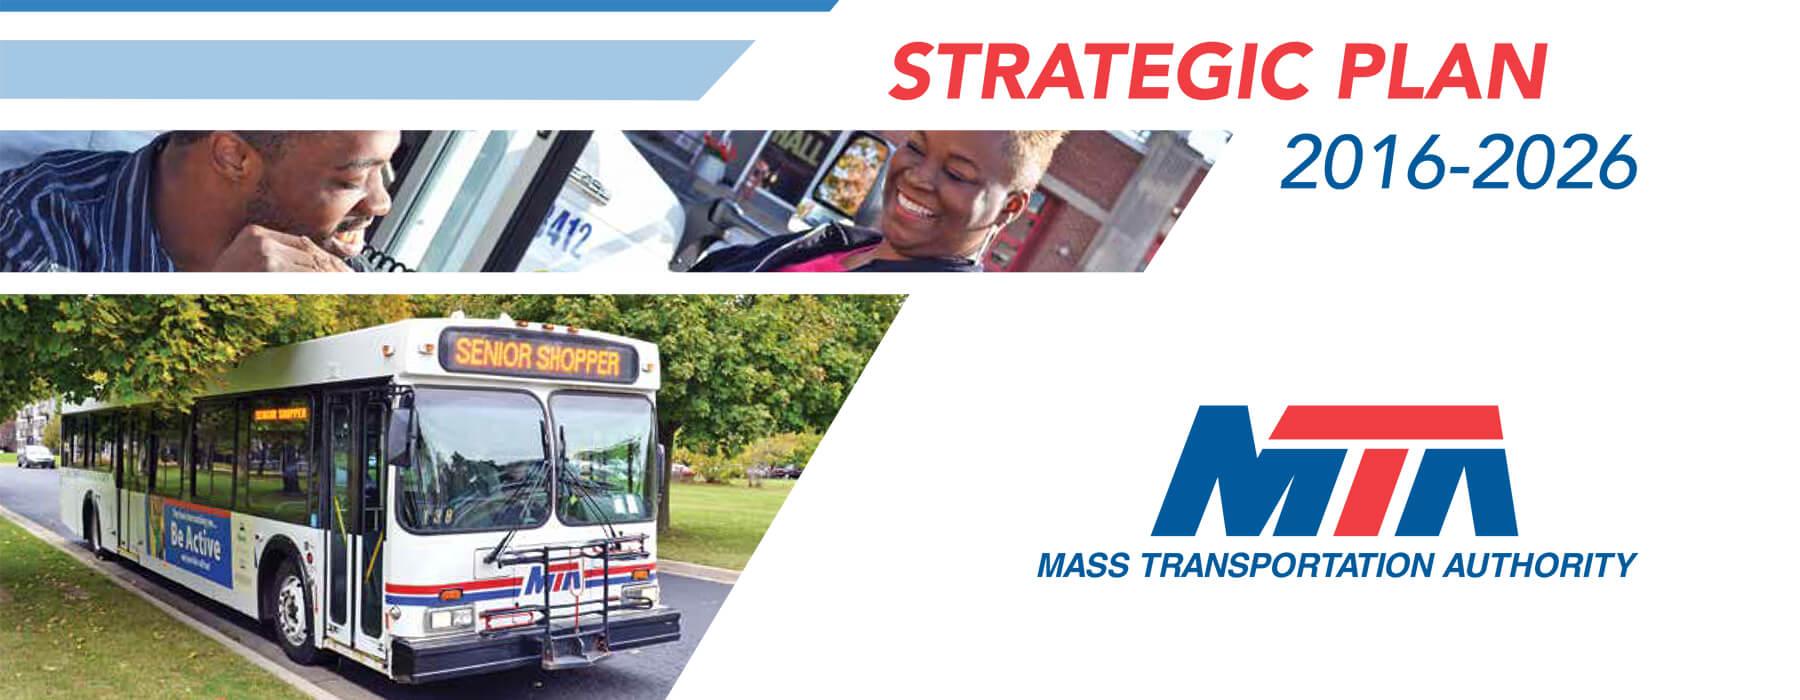 MTA Strategic Plan 2016-2026